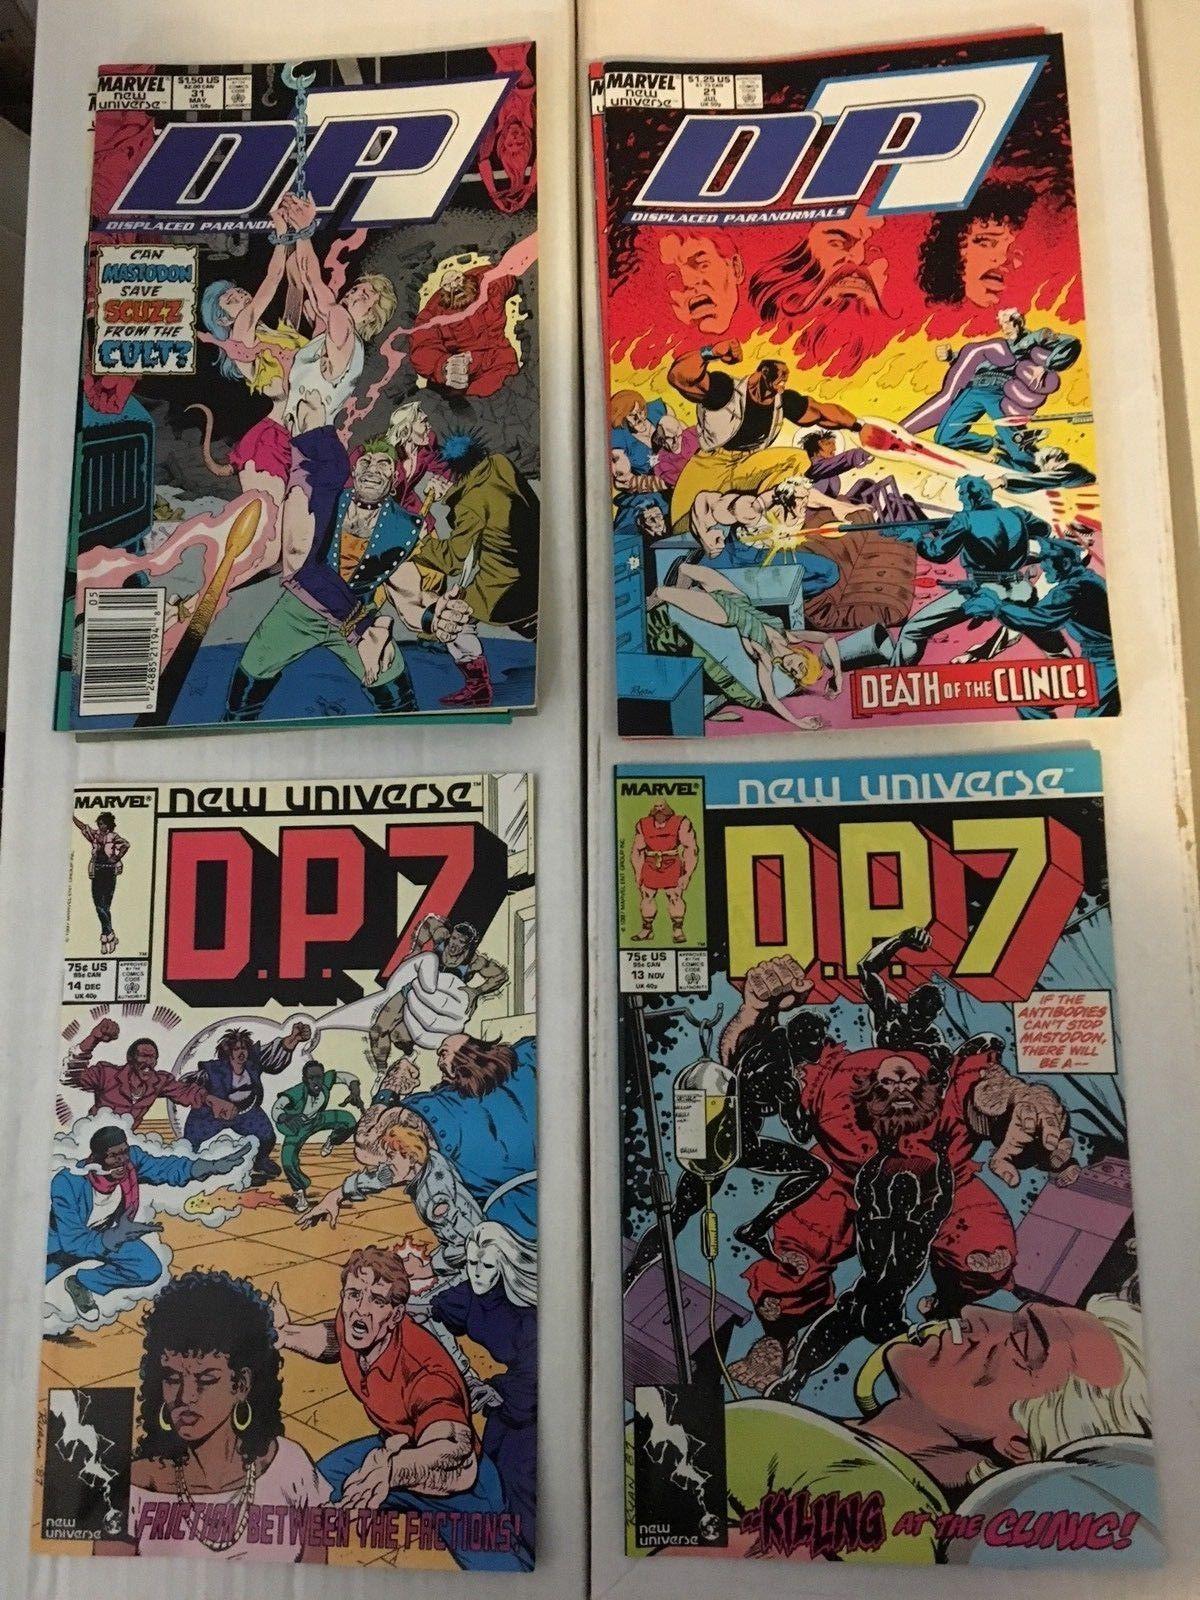 D.P. 7 1 - 32 New Universe Marvel Comic Book COMPLETE SET 33 Comics 1986-89 VF+